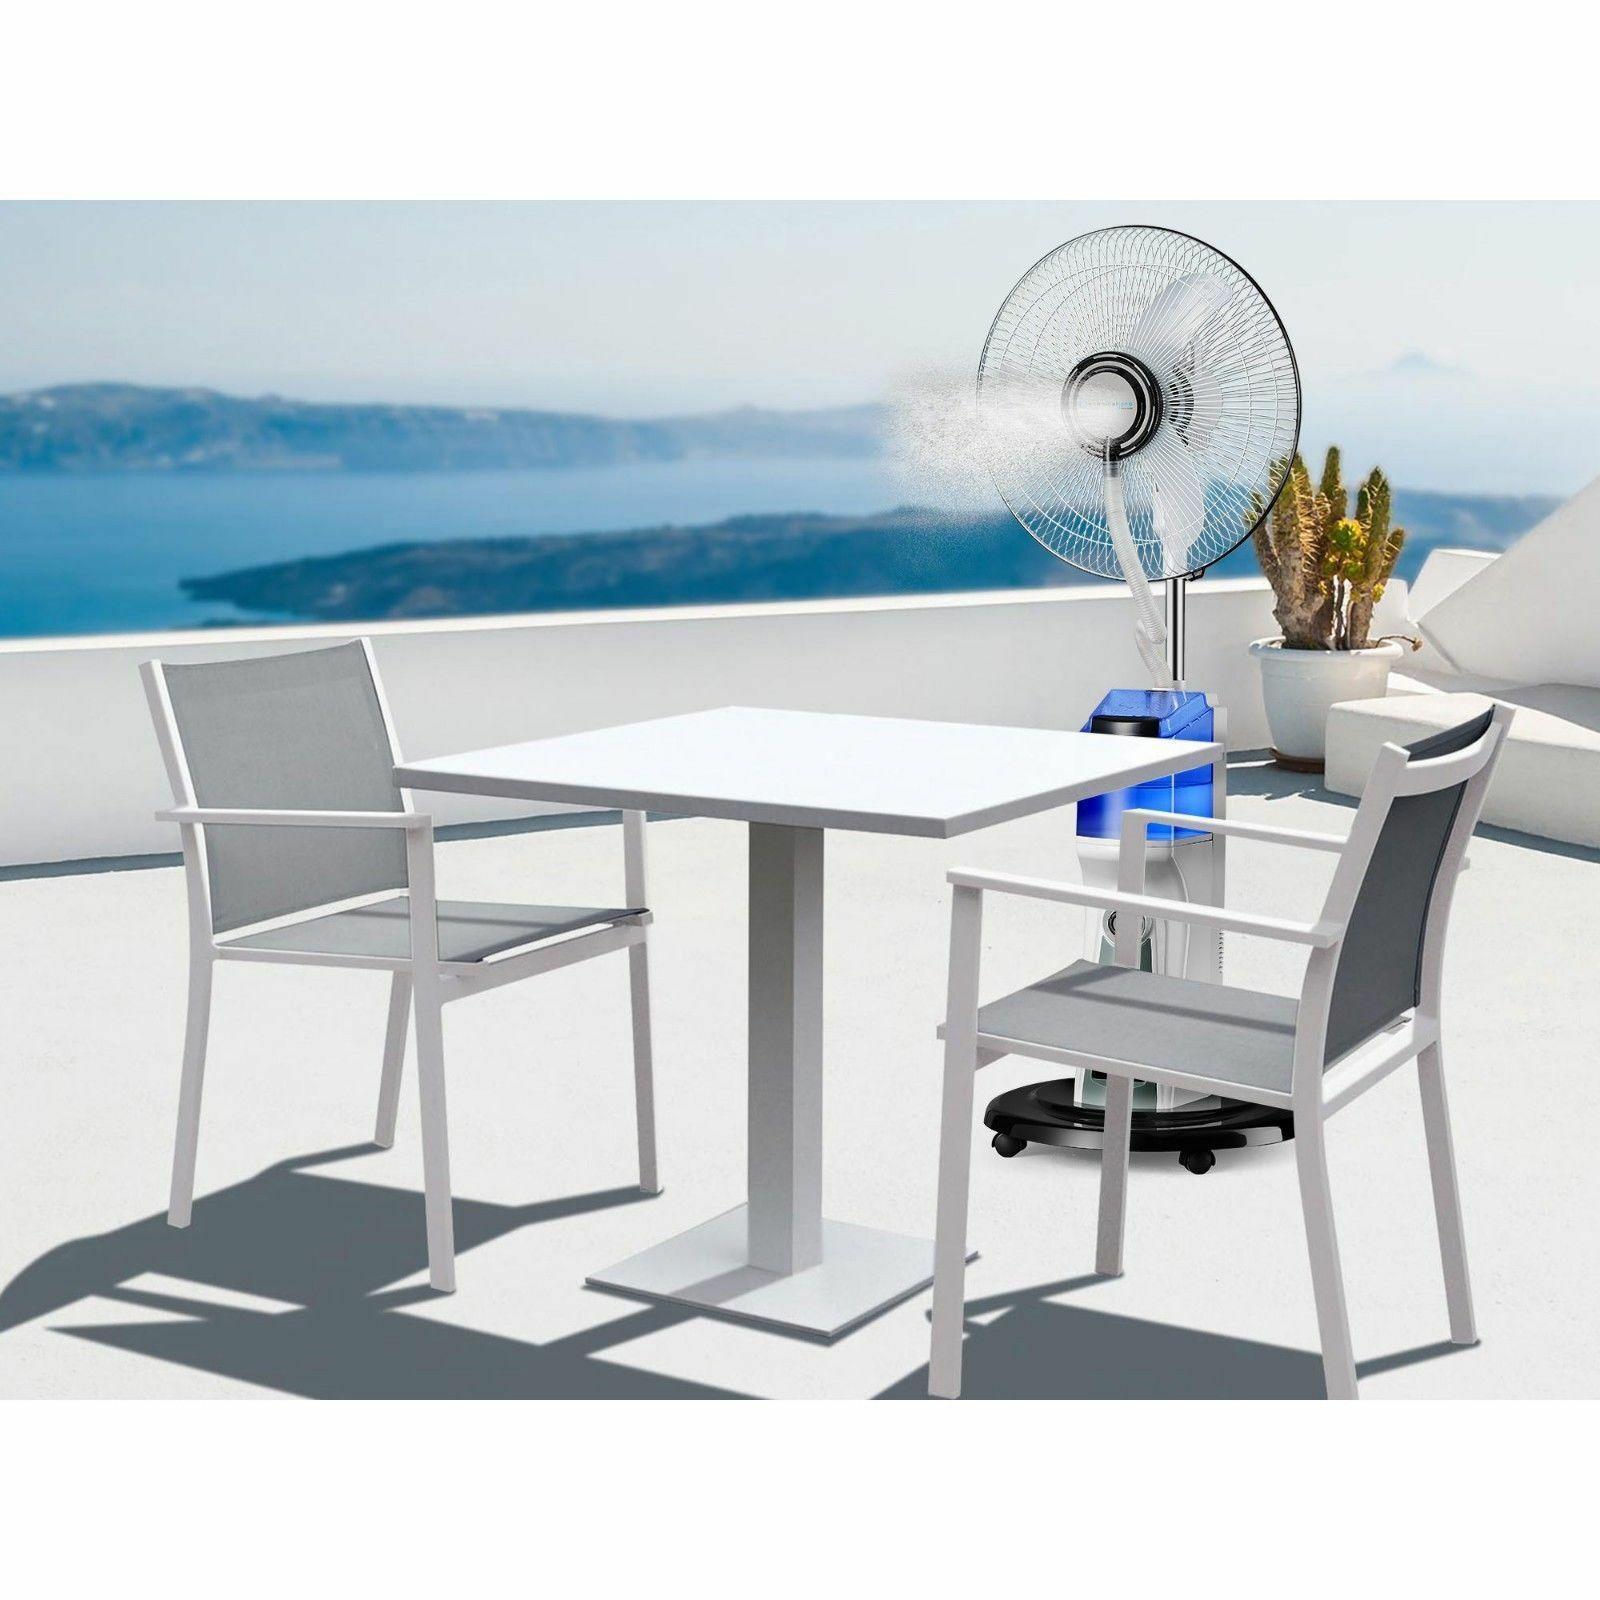 Tpro Rechargeable Misting Portable Fan w/ Powerbank / USB White OFMIST2